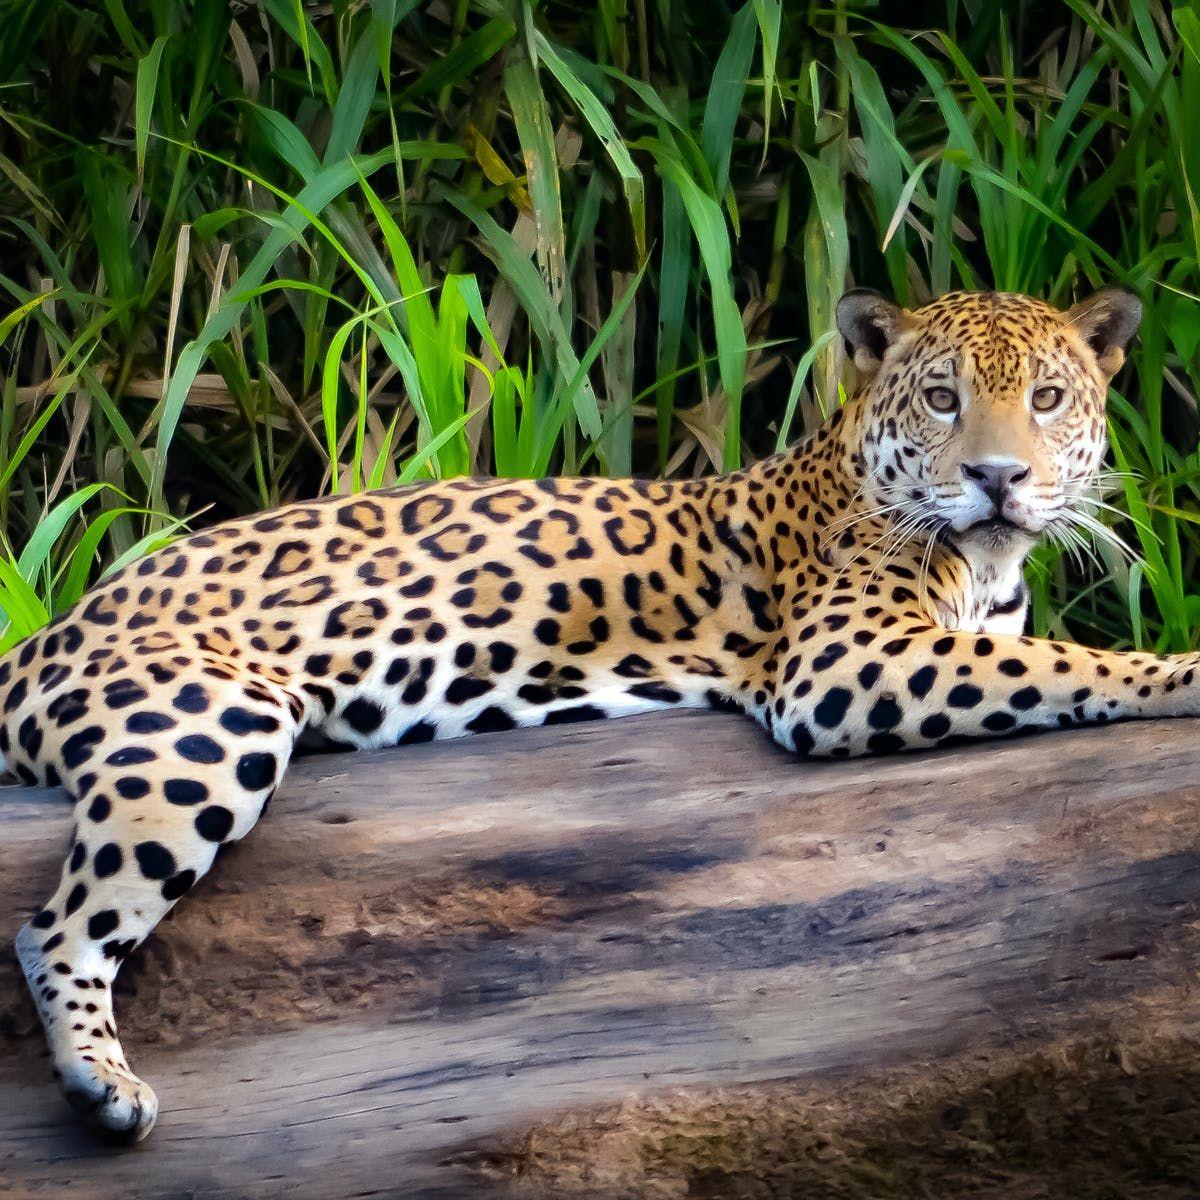 Jaguar in 2020 Jaguar animal, Jaguar animal facts, Bird